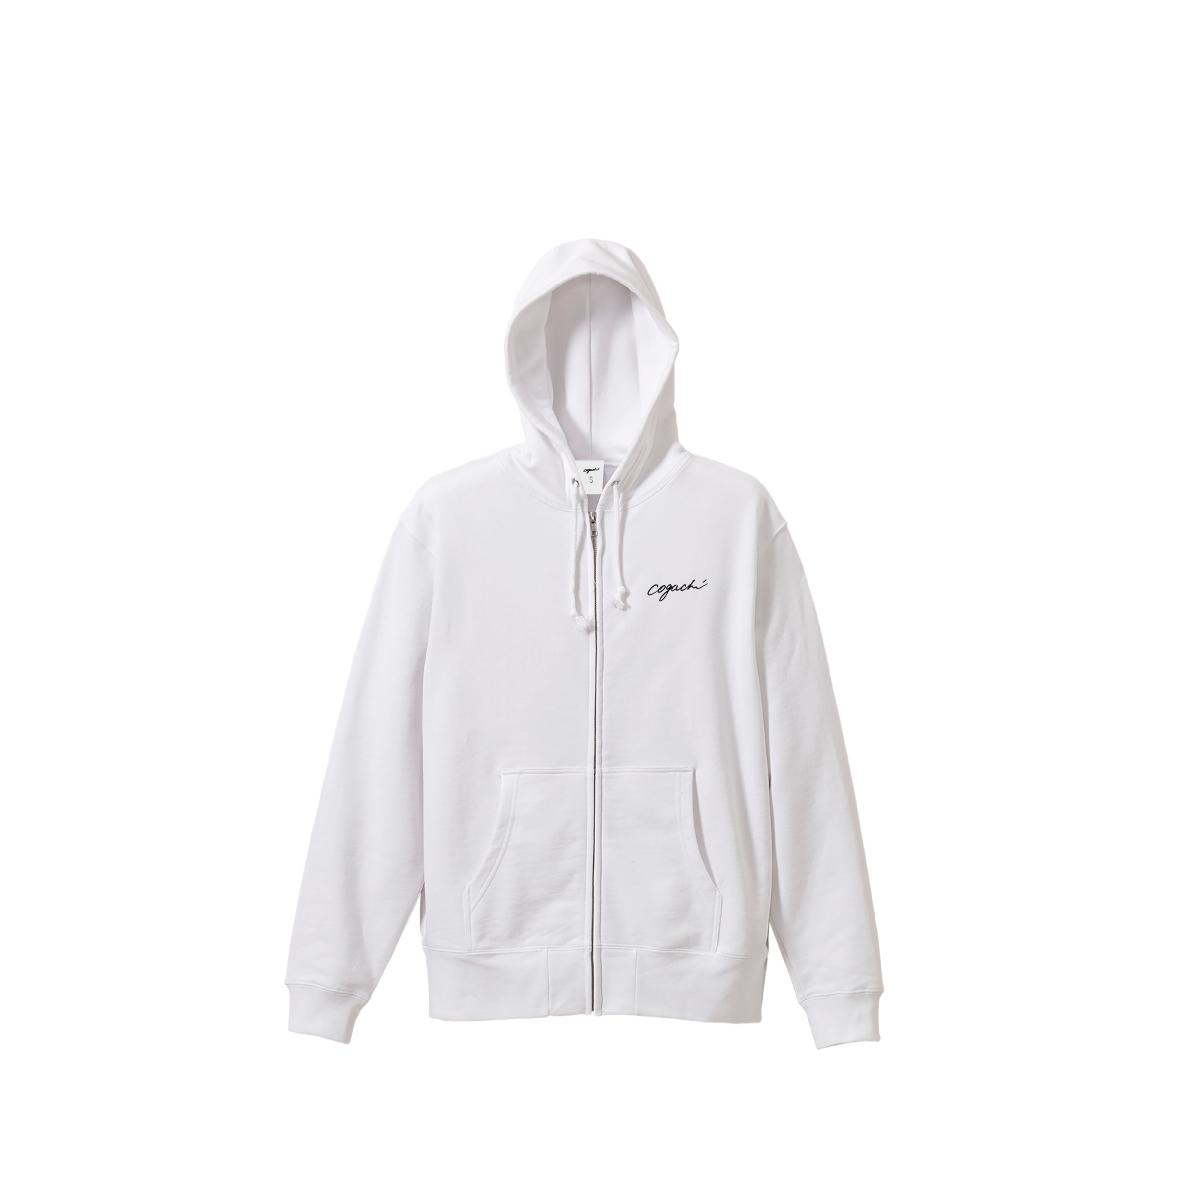 1991 zip hoodie(WHITE)